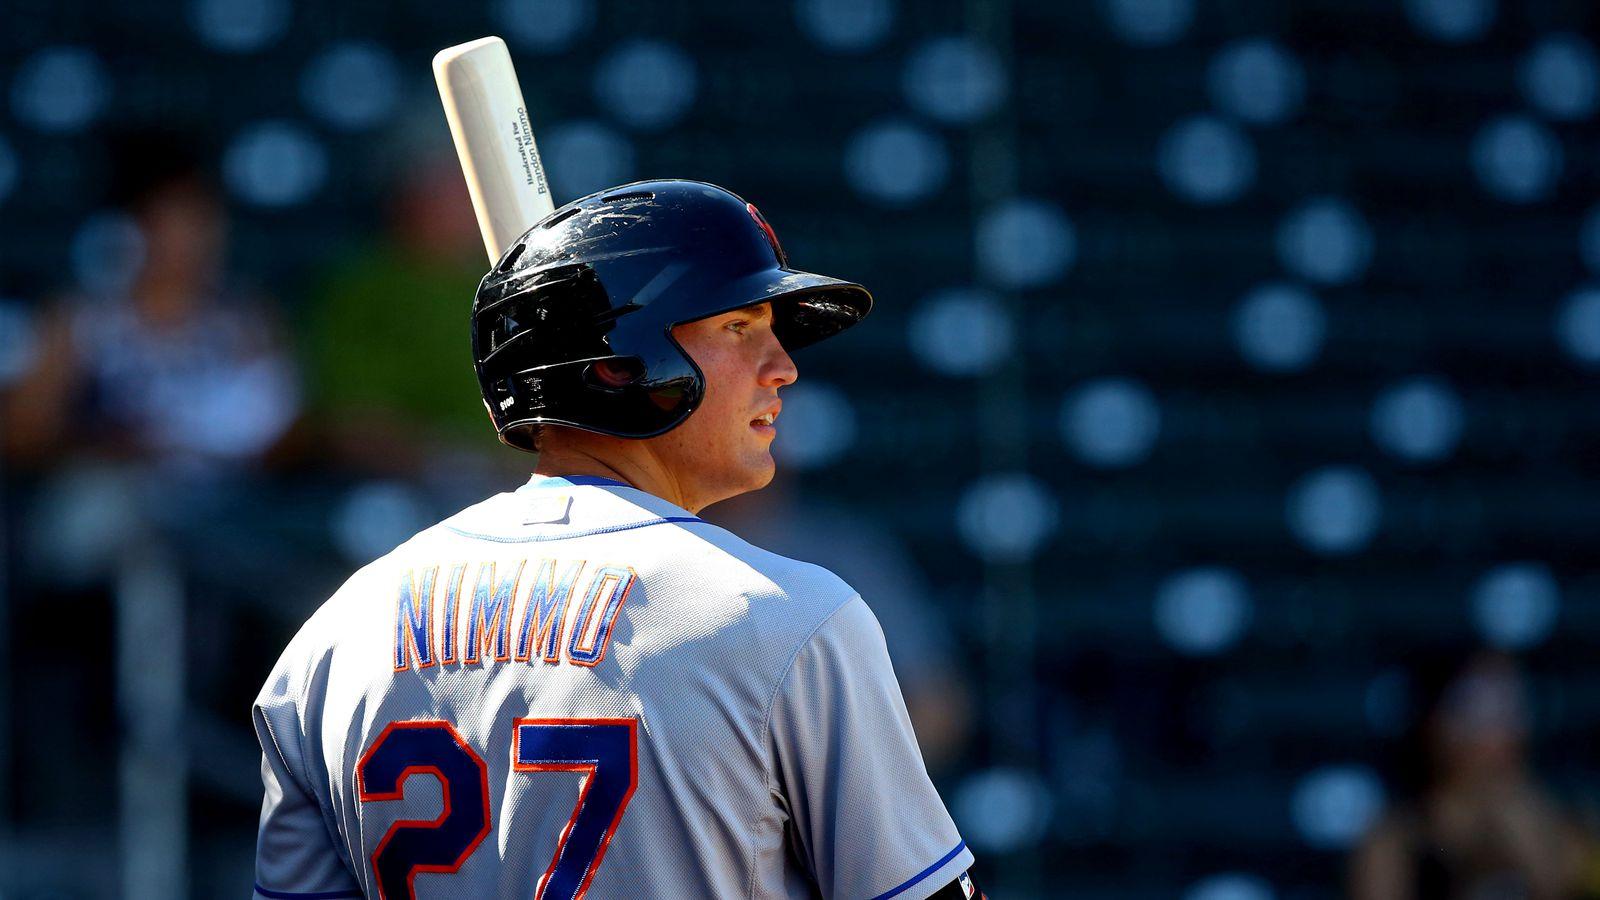 an analysis of the minor league baseball